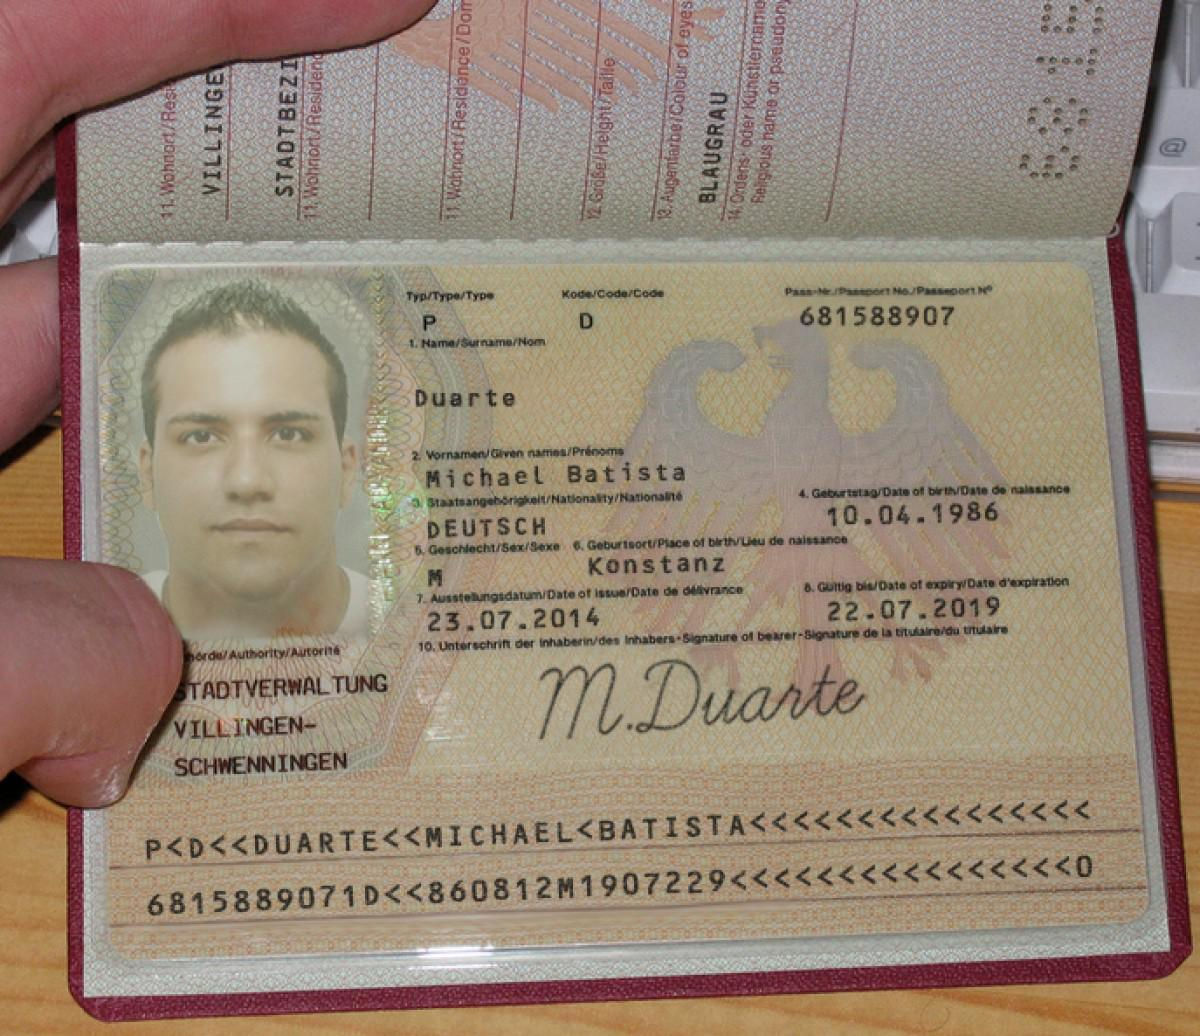 Lockerdome - visa License Passport Id trace insightdanang com